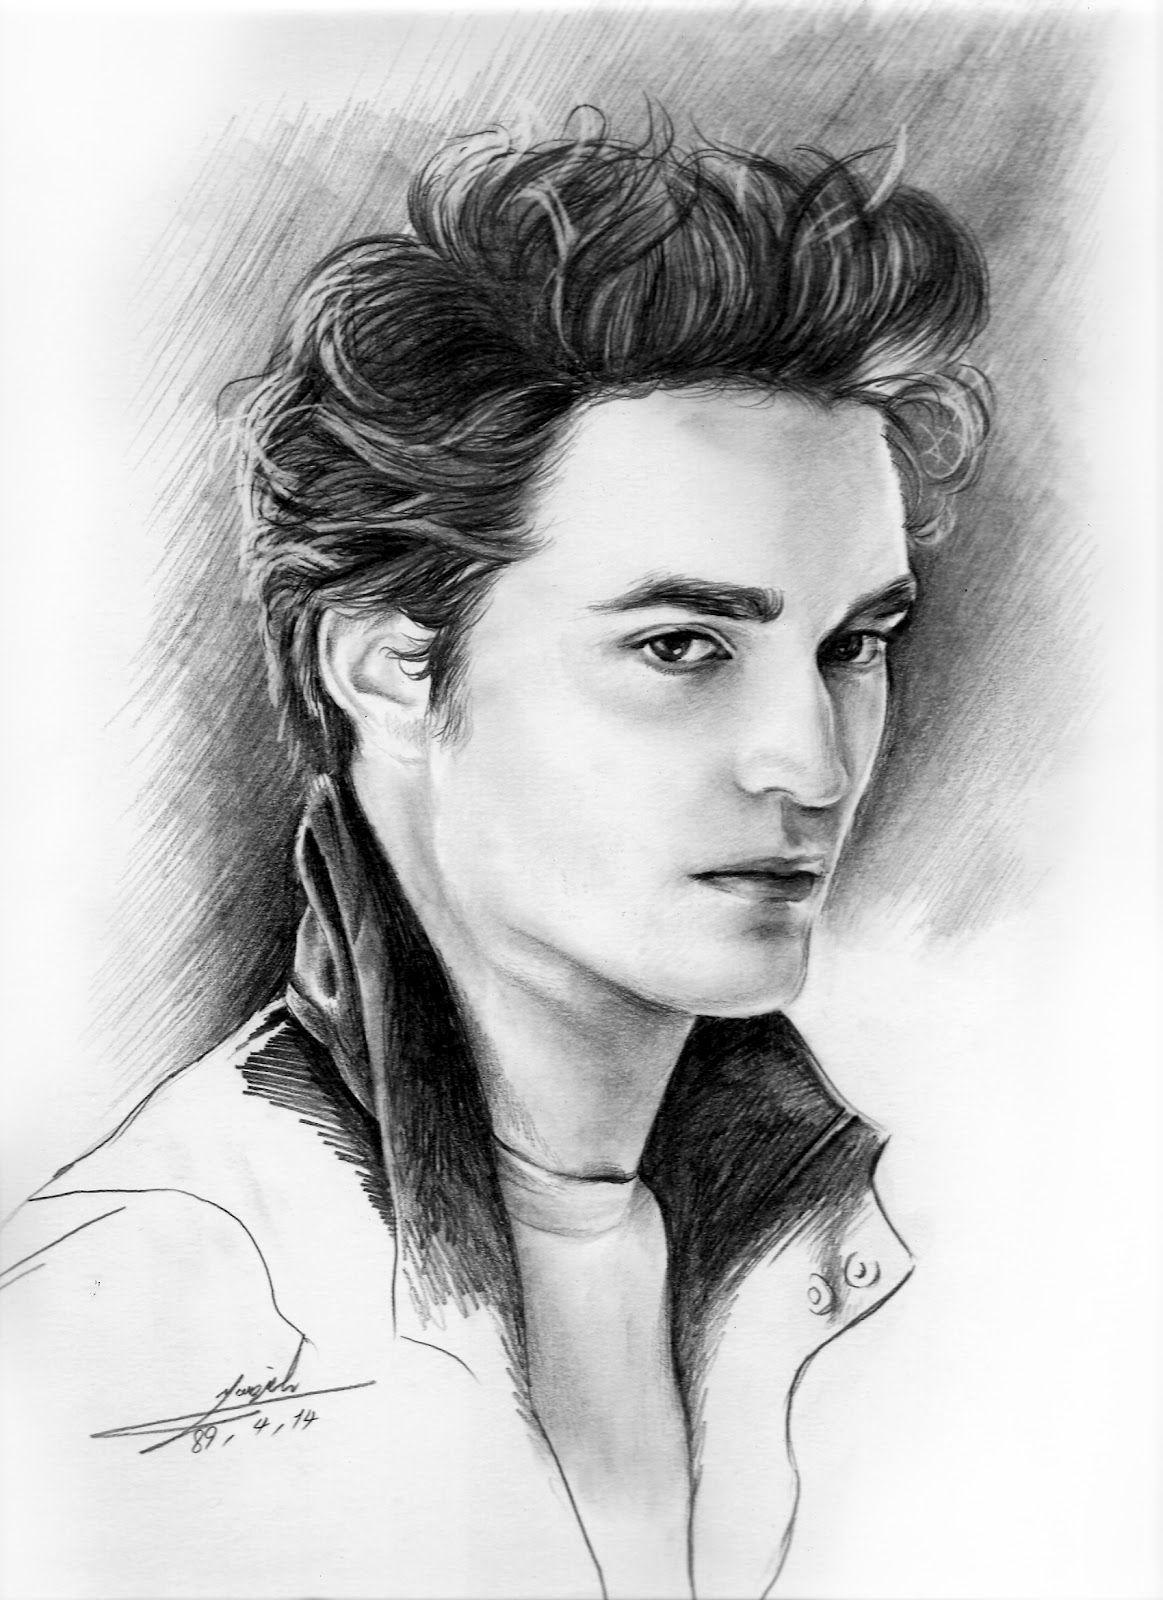 Fotos Y Dibujo De Robert Pattinson Dibujos Unicos Dibujos De